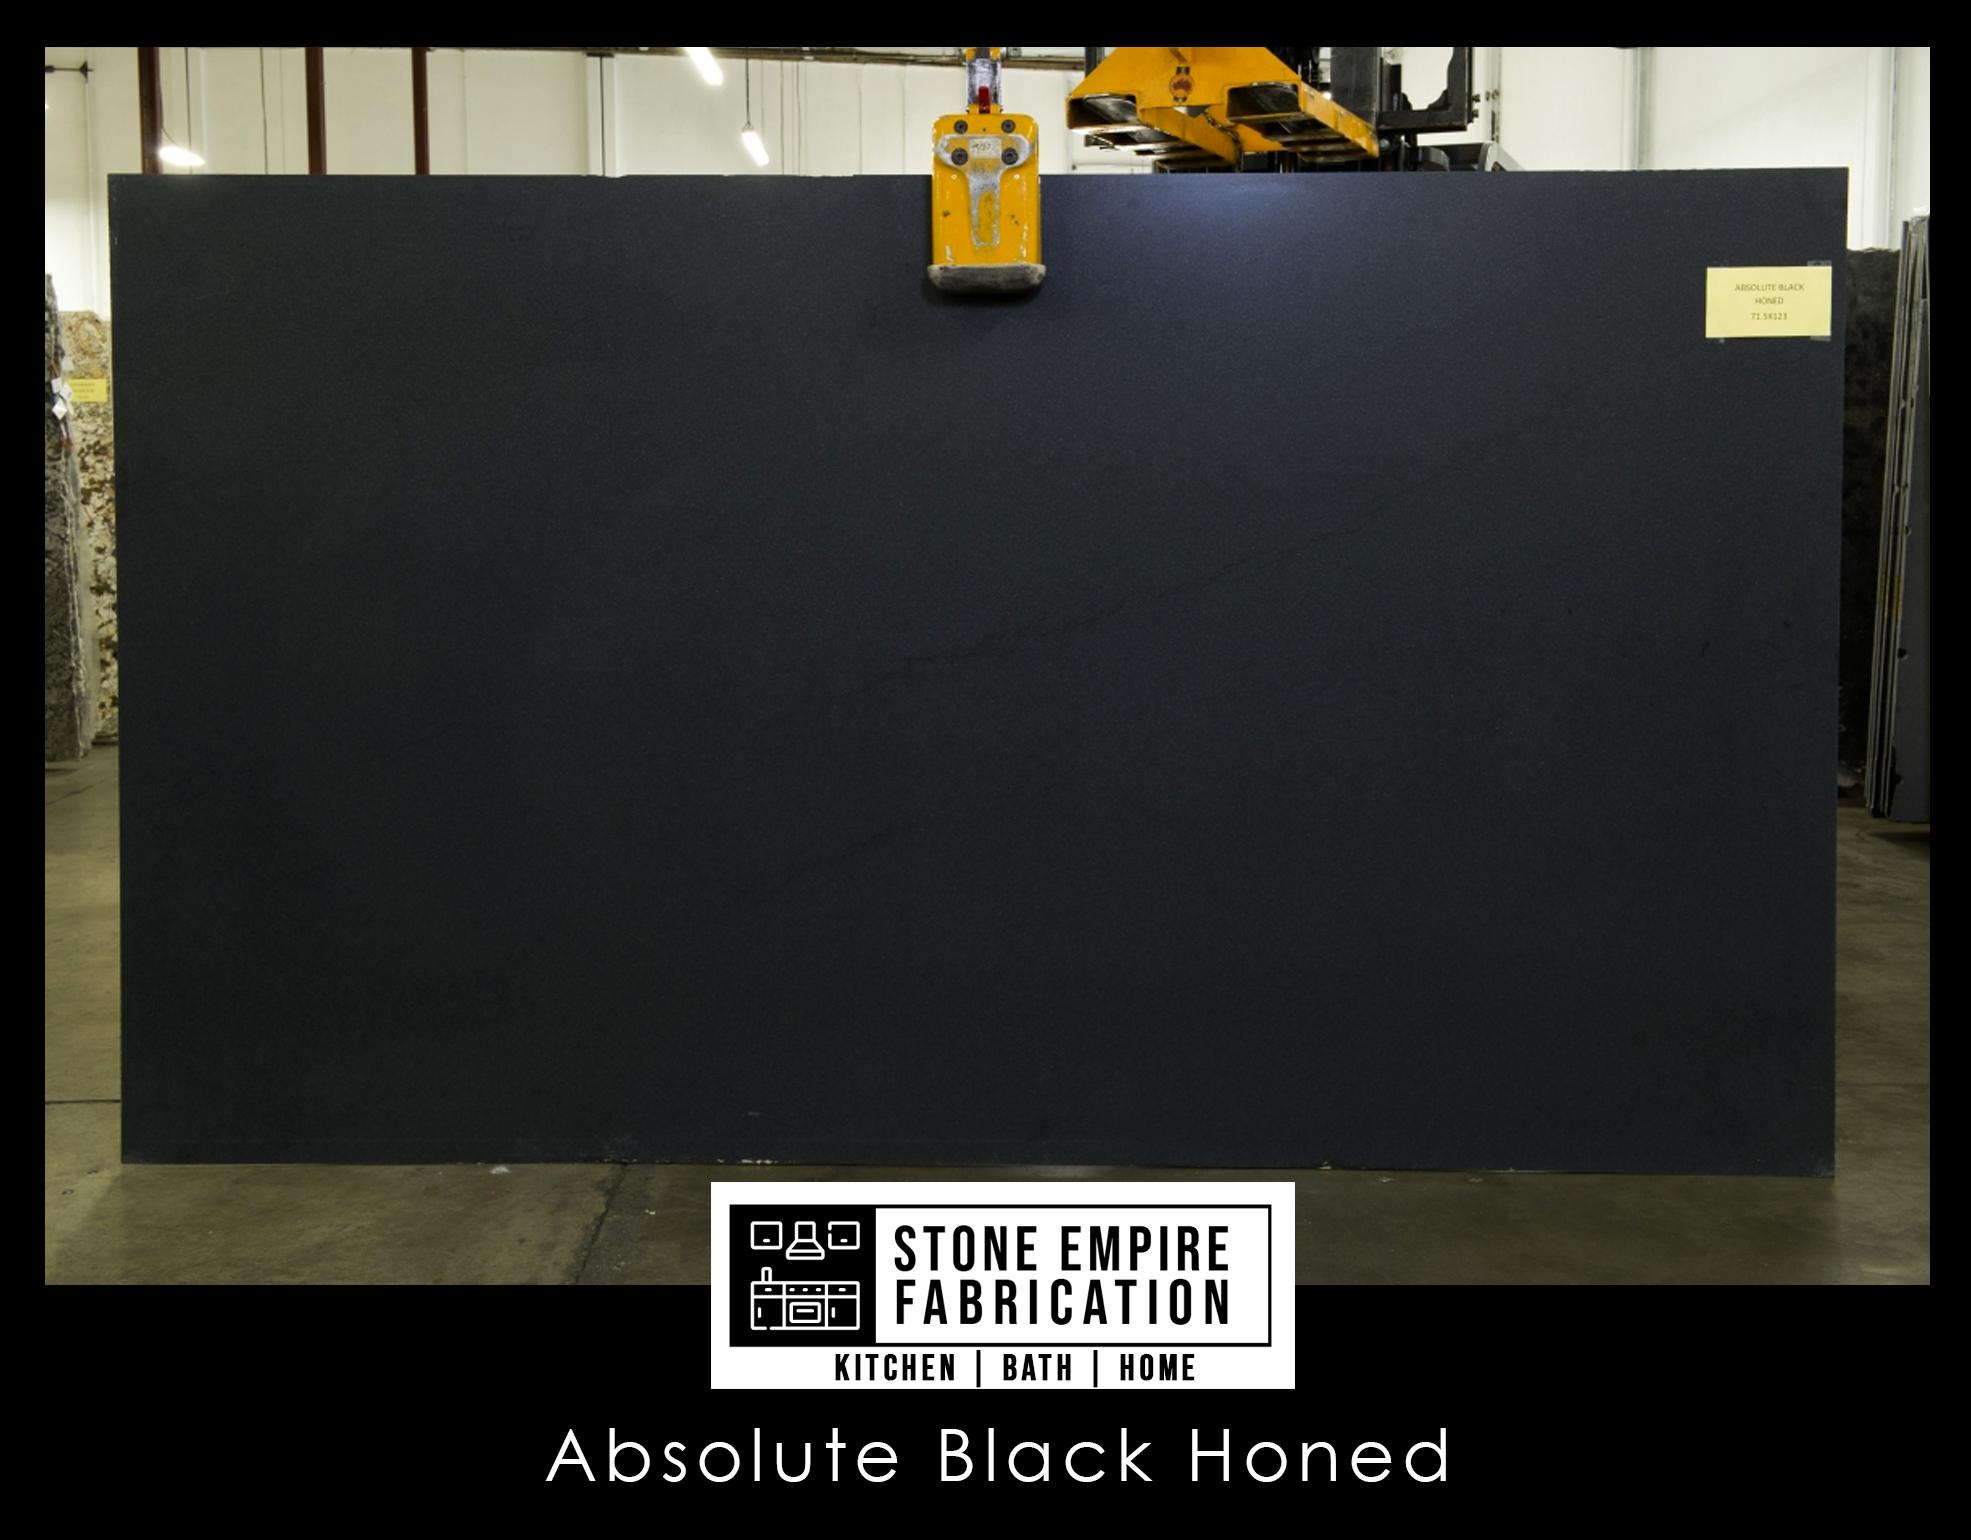 Absoulte-Black-Honed